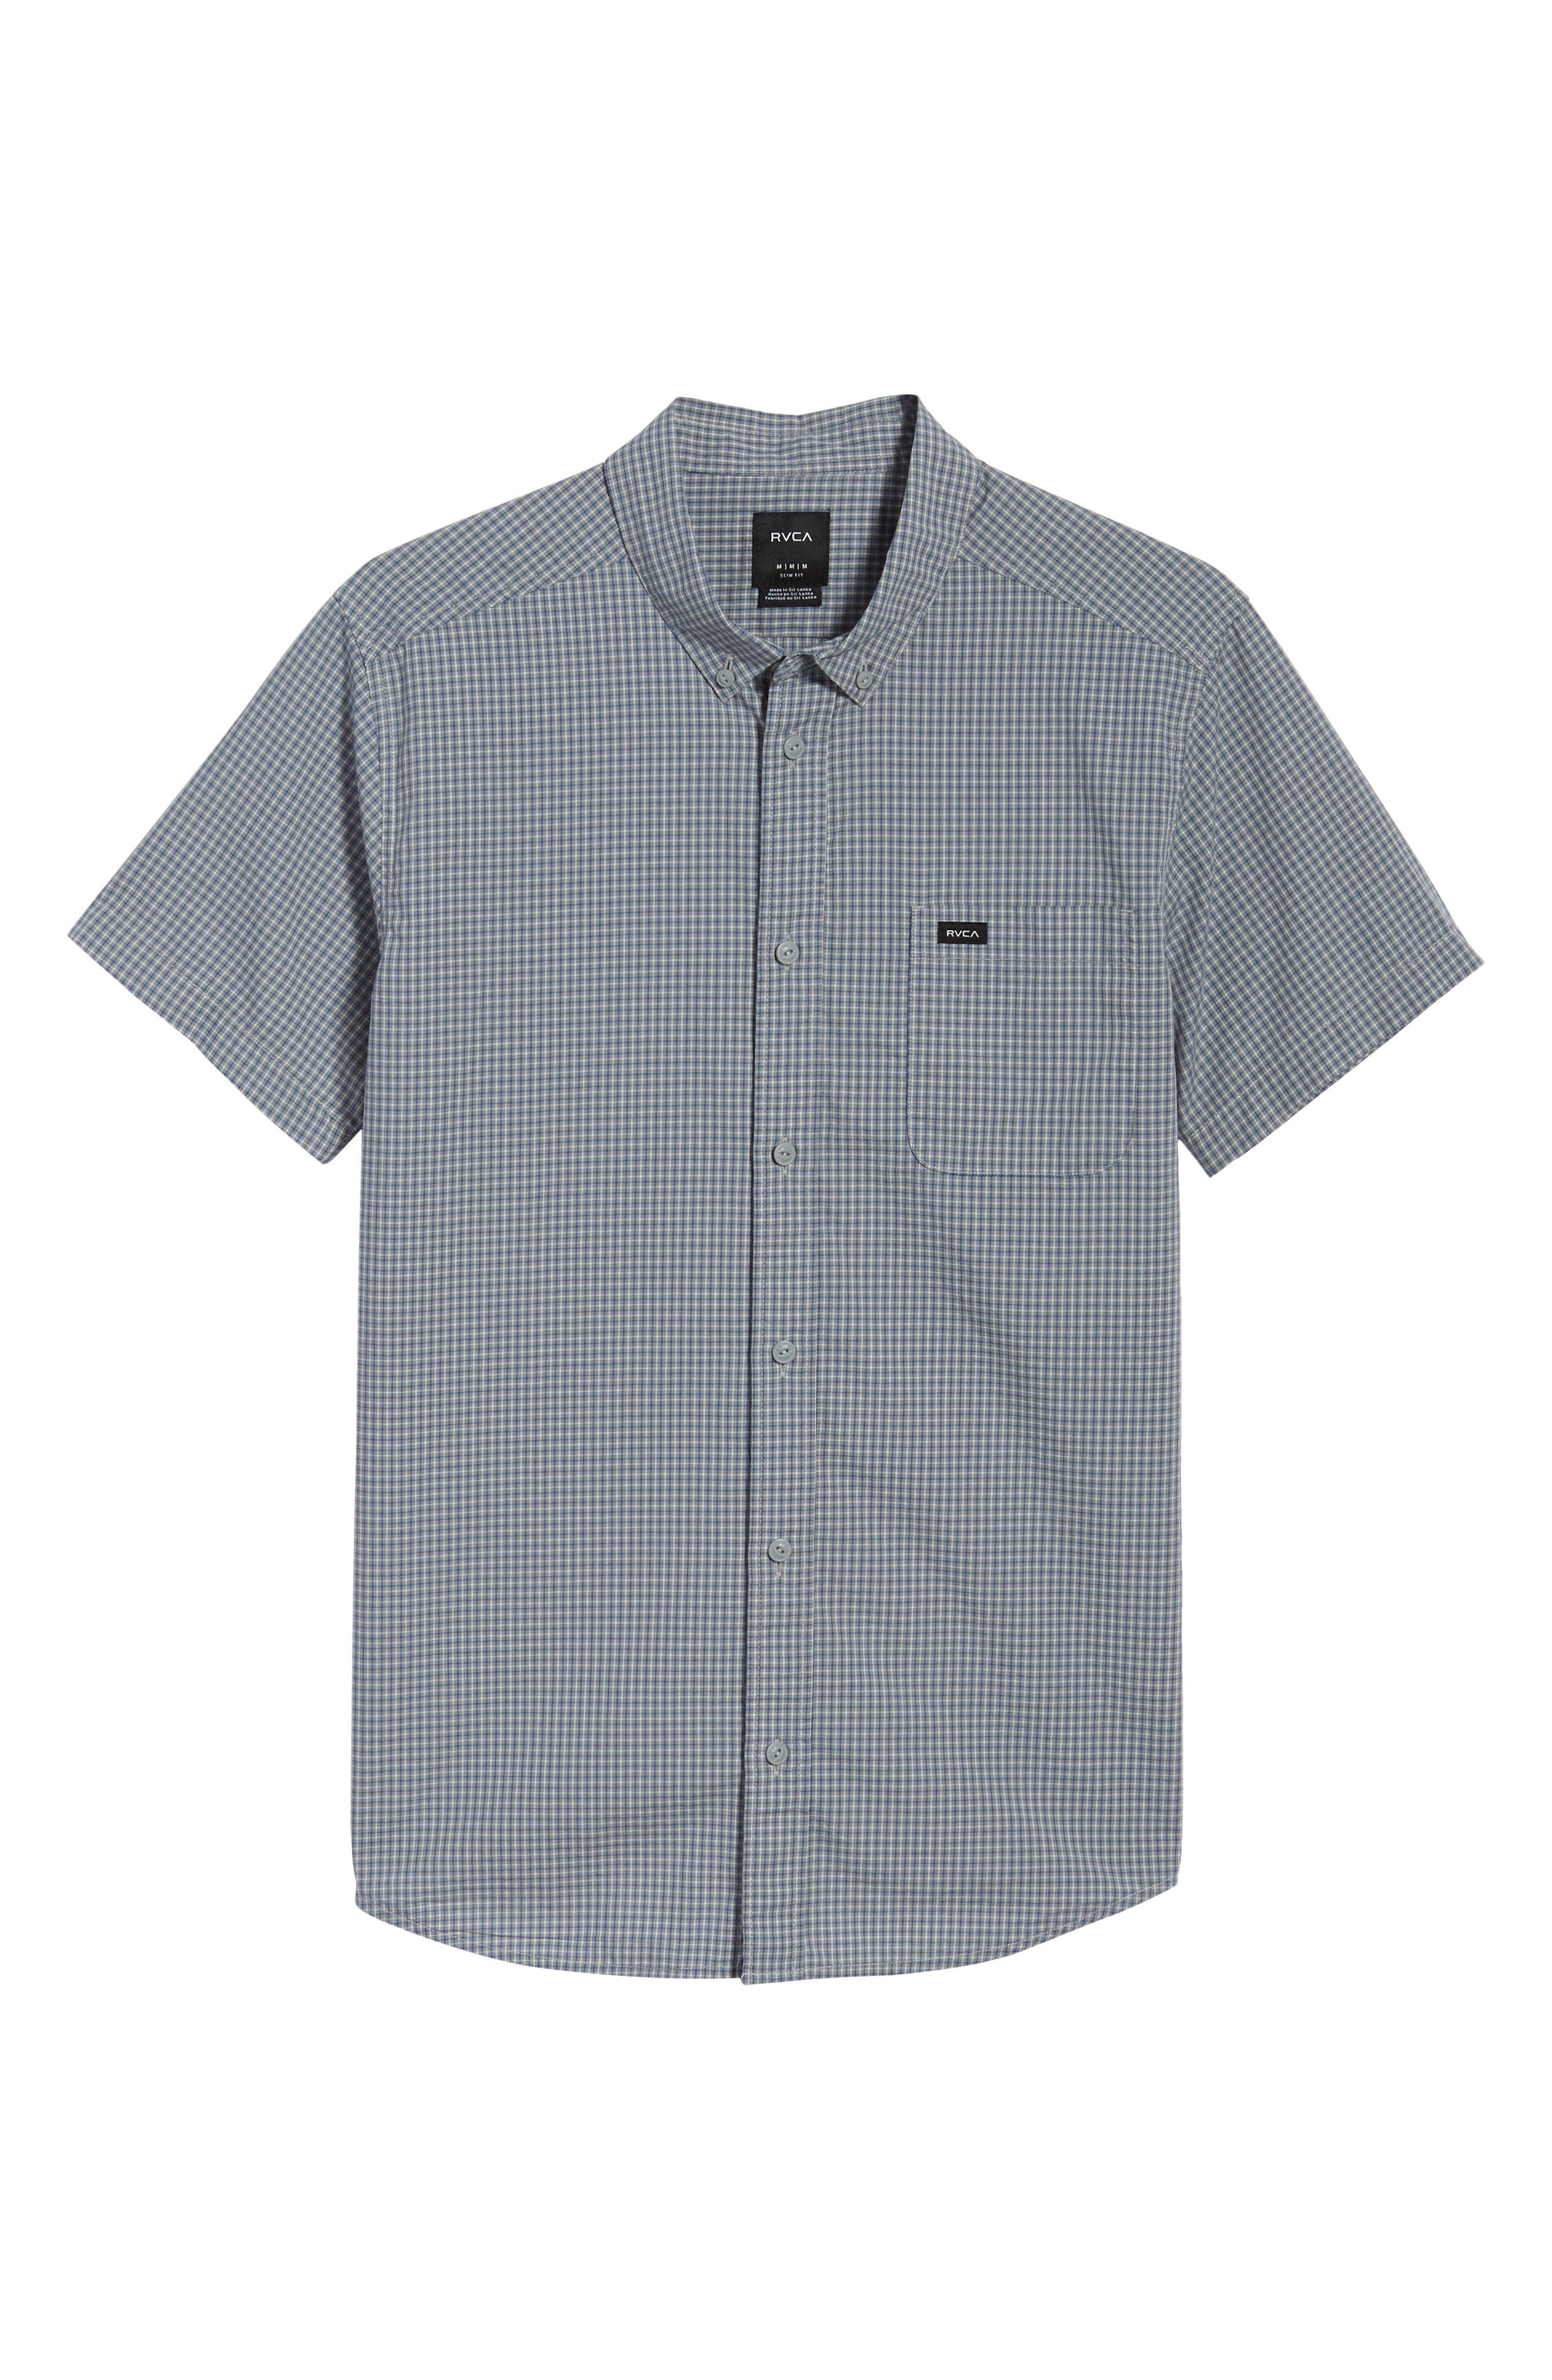 Staple Woven Shirt,                             Alternate thumbnail 6, color,                             026